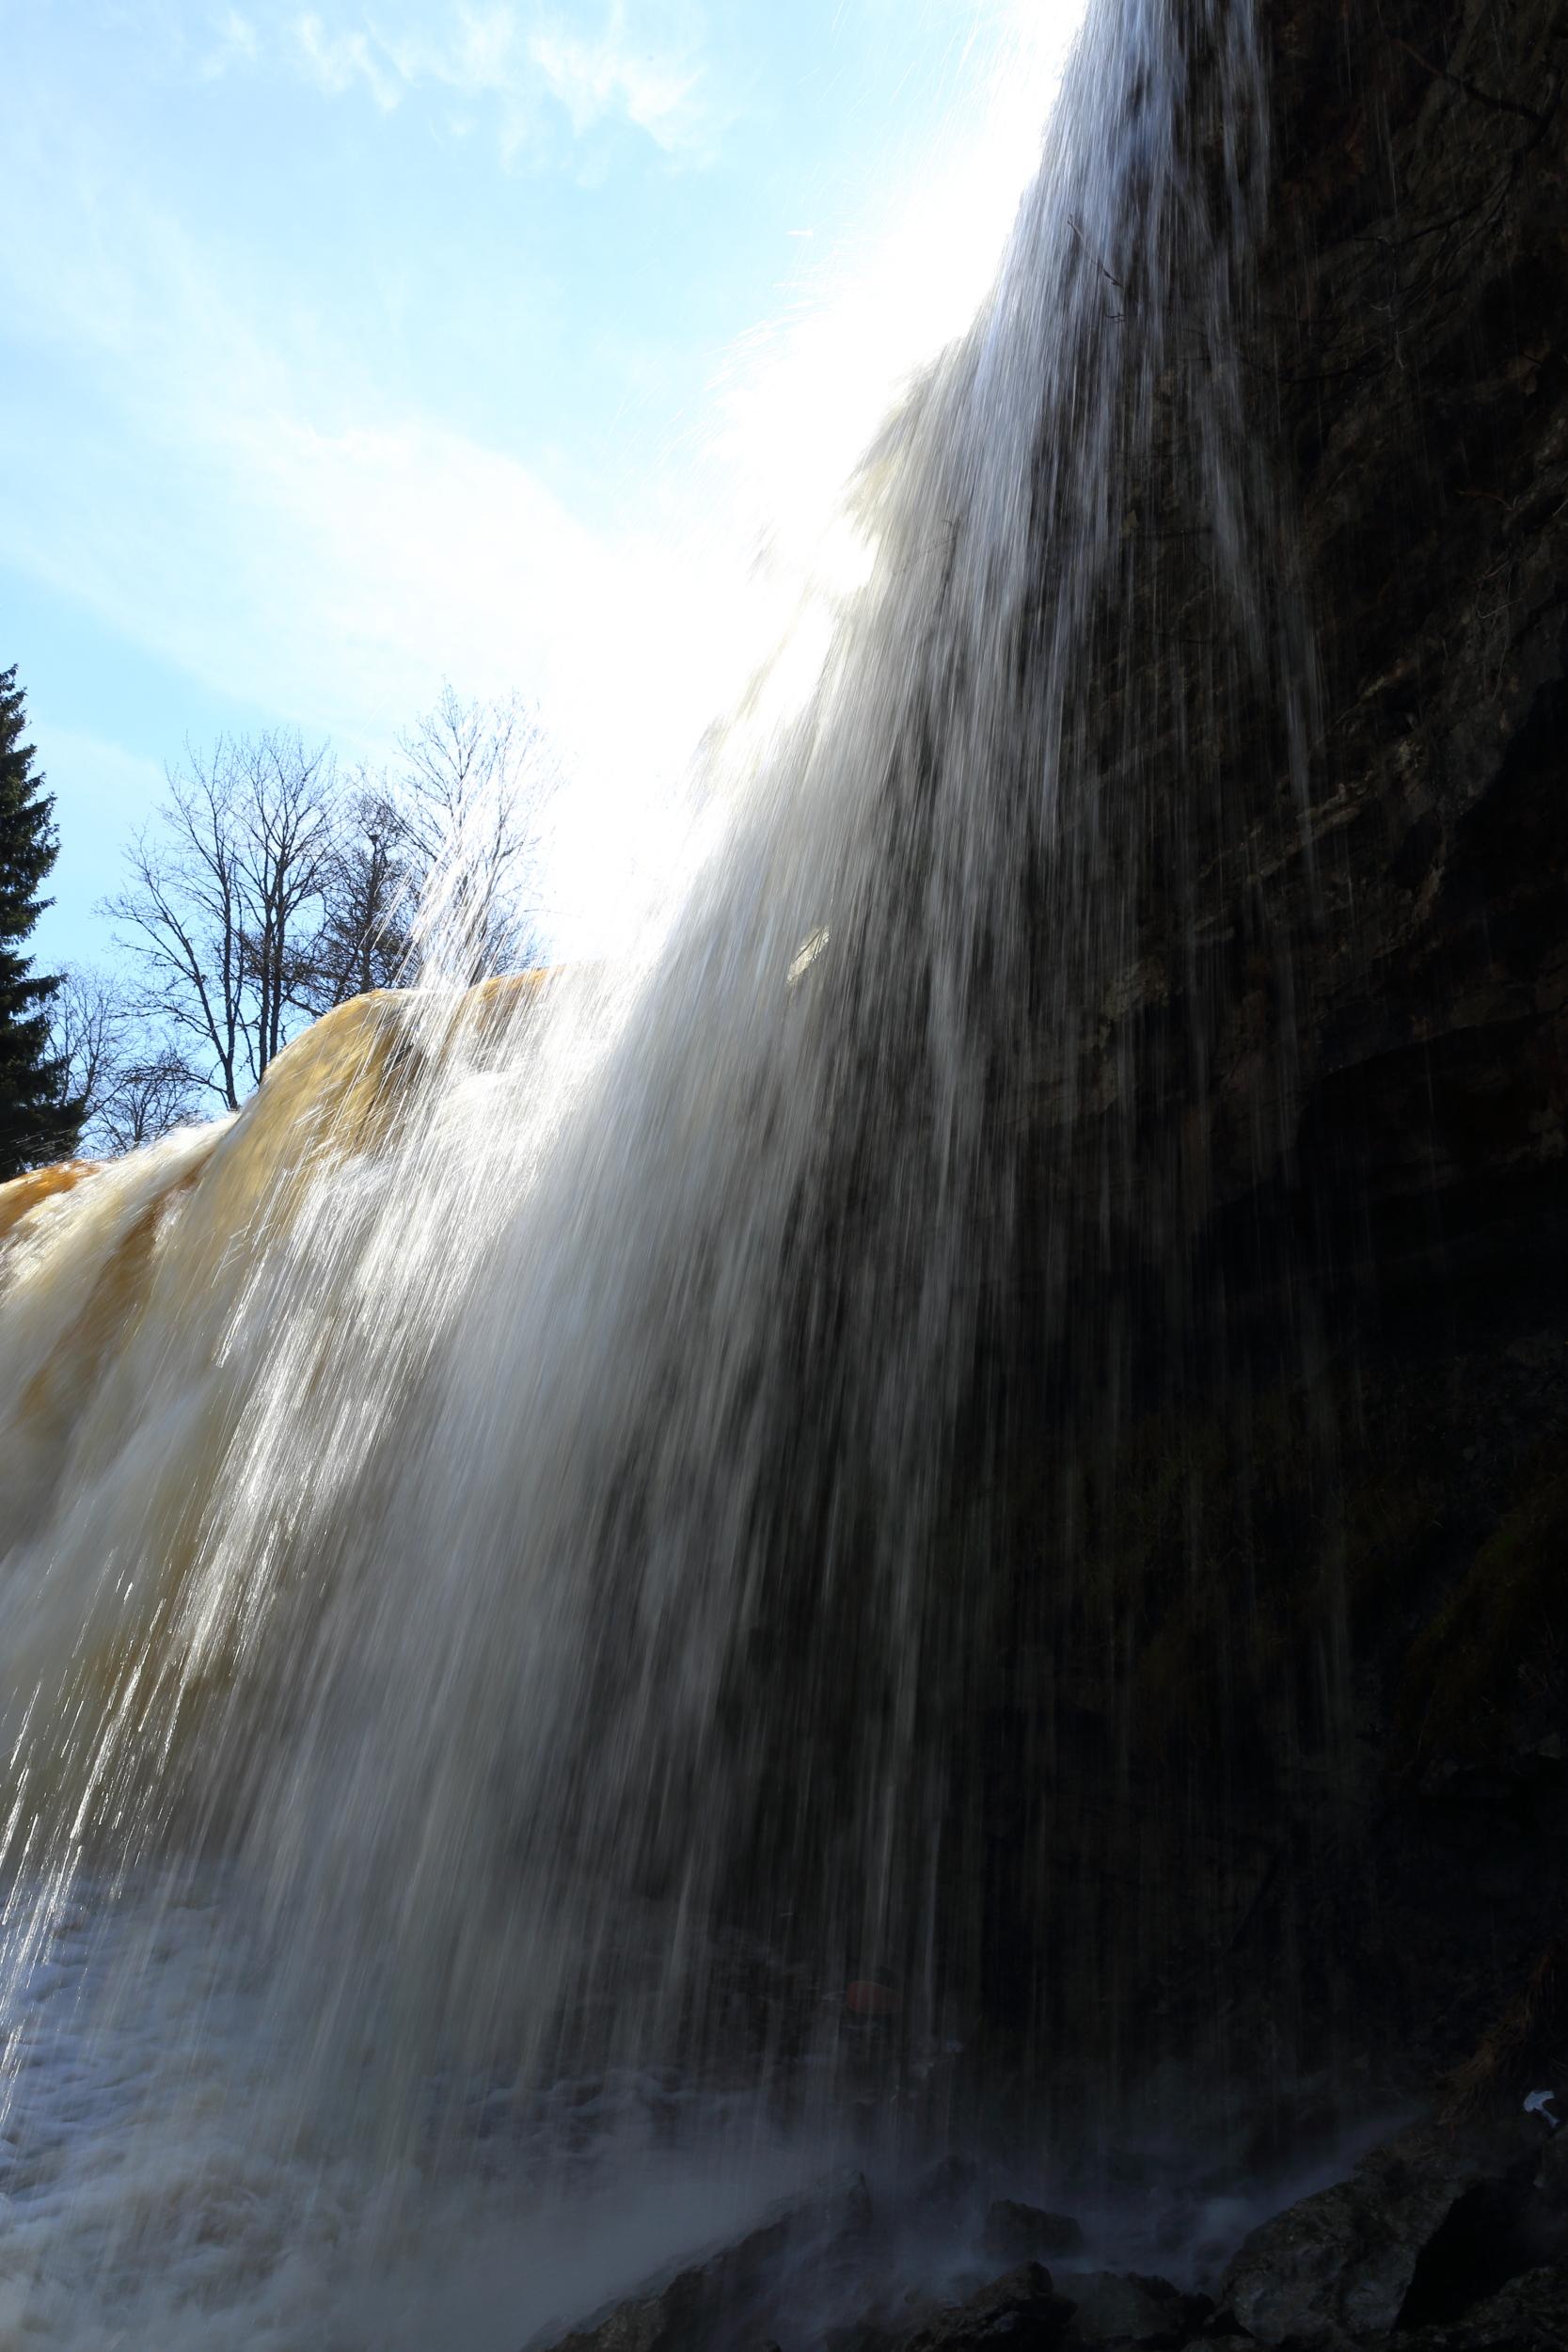 Keilan vesiputous, Viro